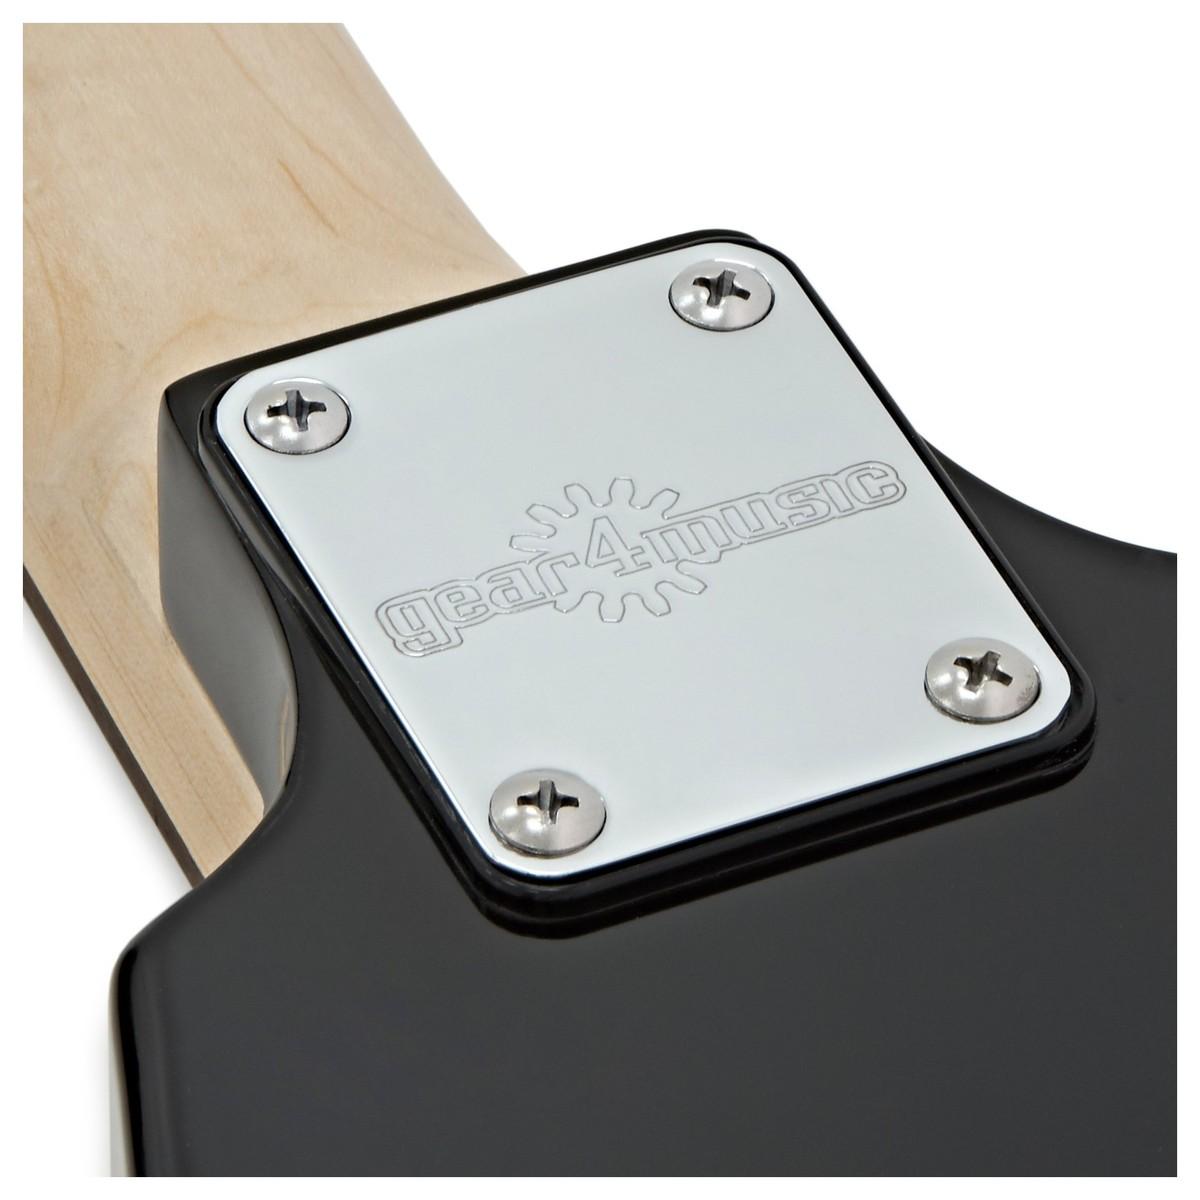 69e1fa2e92 Harlem V Electric Guitar + Case by Gear4music, Black - Box Opened at ...